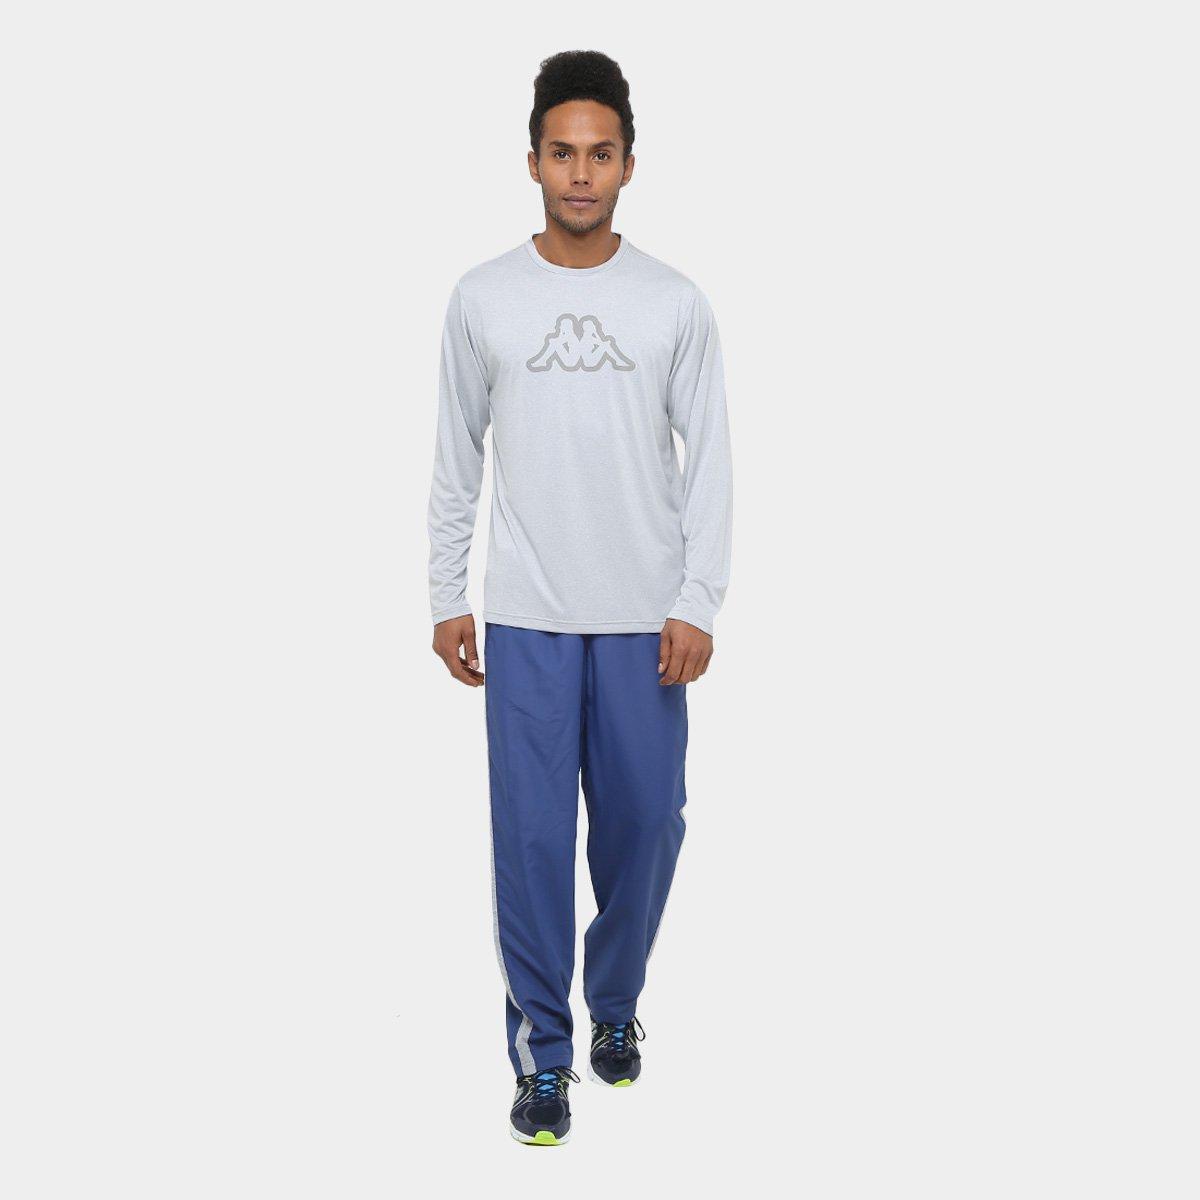 Camiseta Kappa Nassiri Manga Longa Masculina - Cinza - Compre Agora ... 9019e4d1387eb